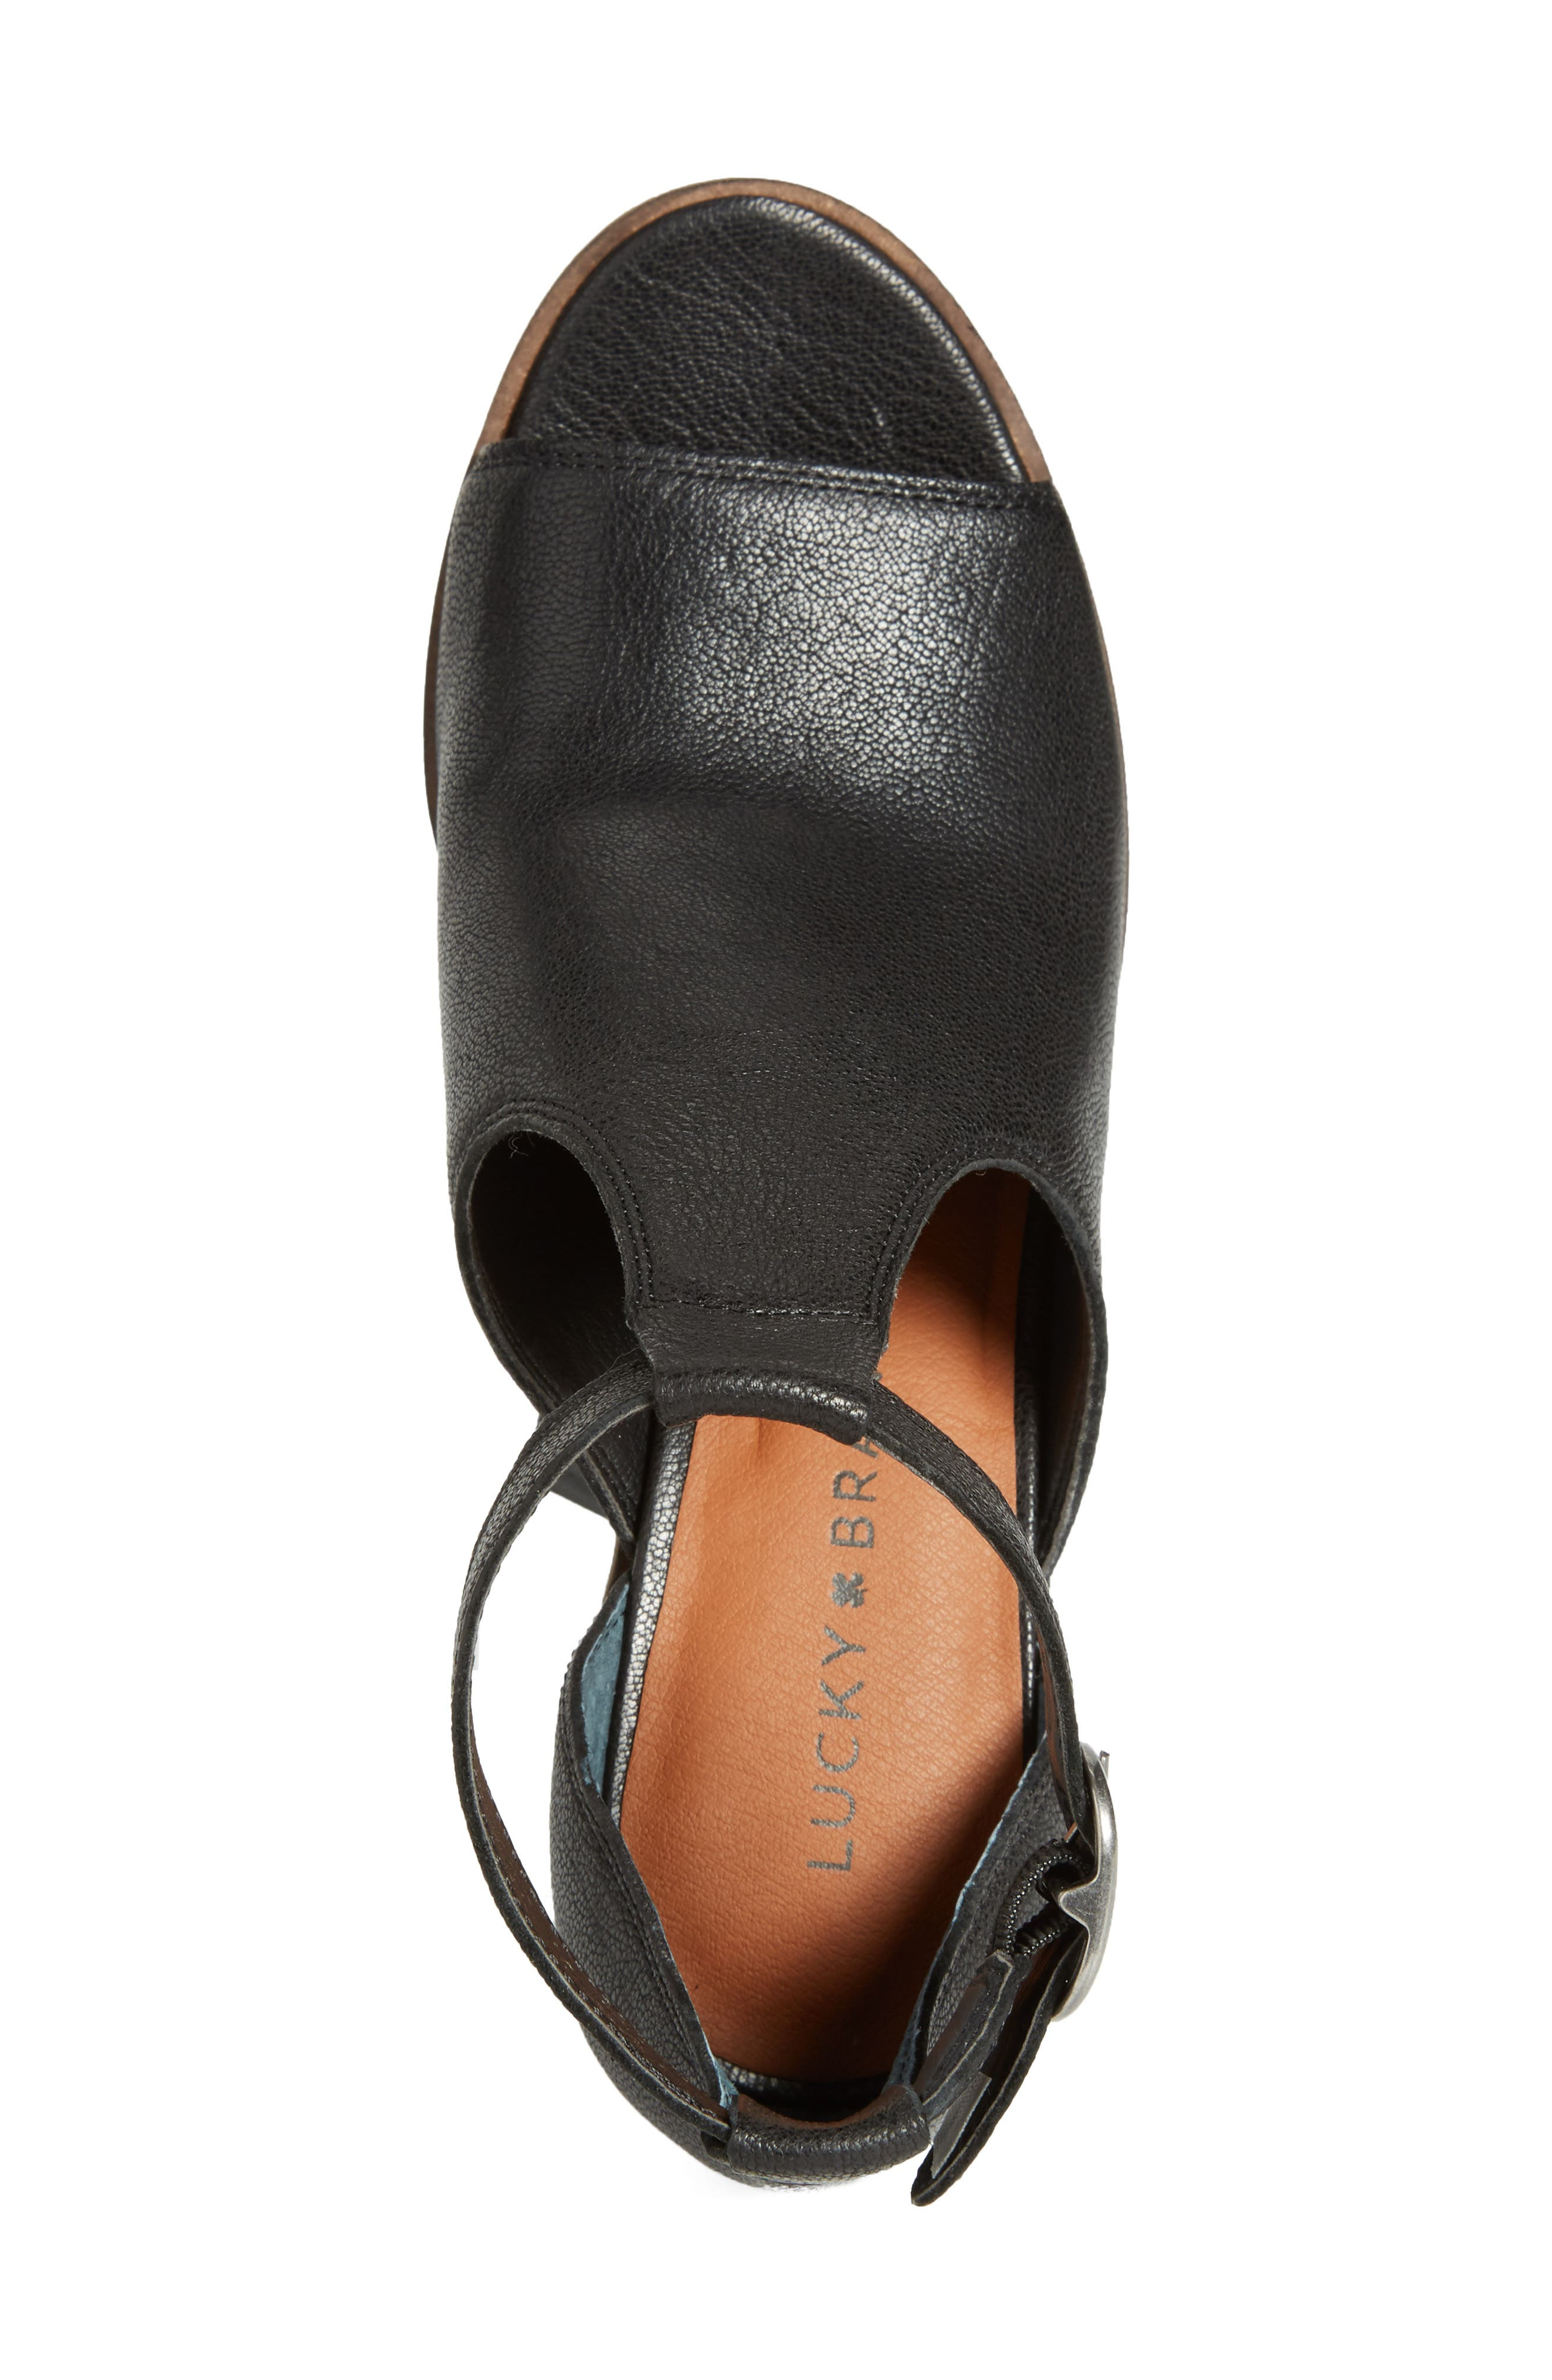 Kadian Block Heel Sandal,                             Alternate thumbnail 5, color,                             Black Leather